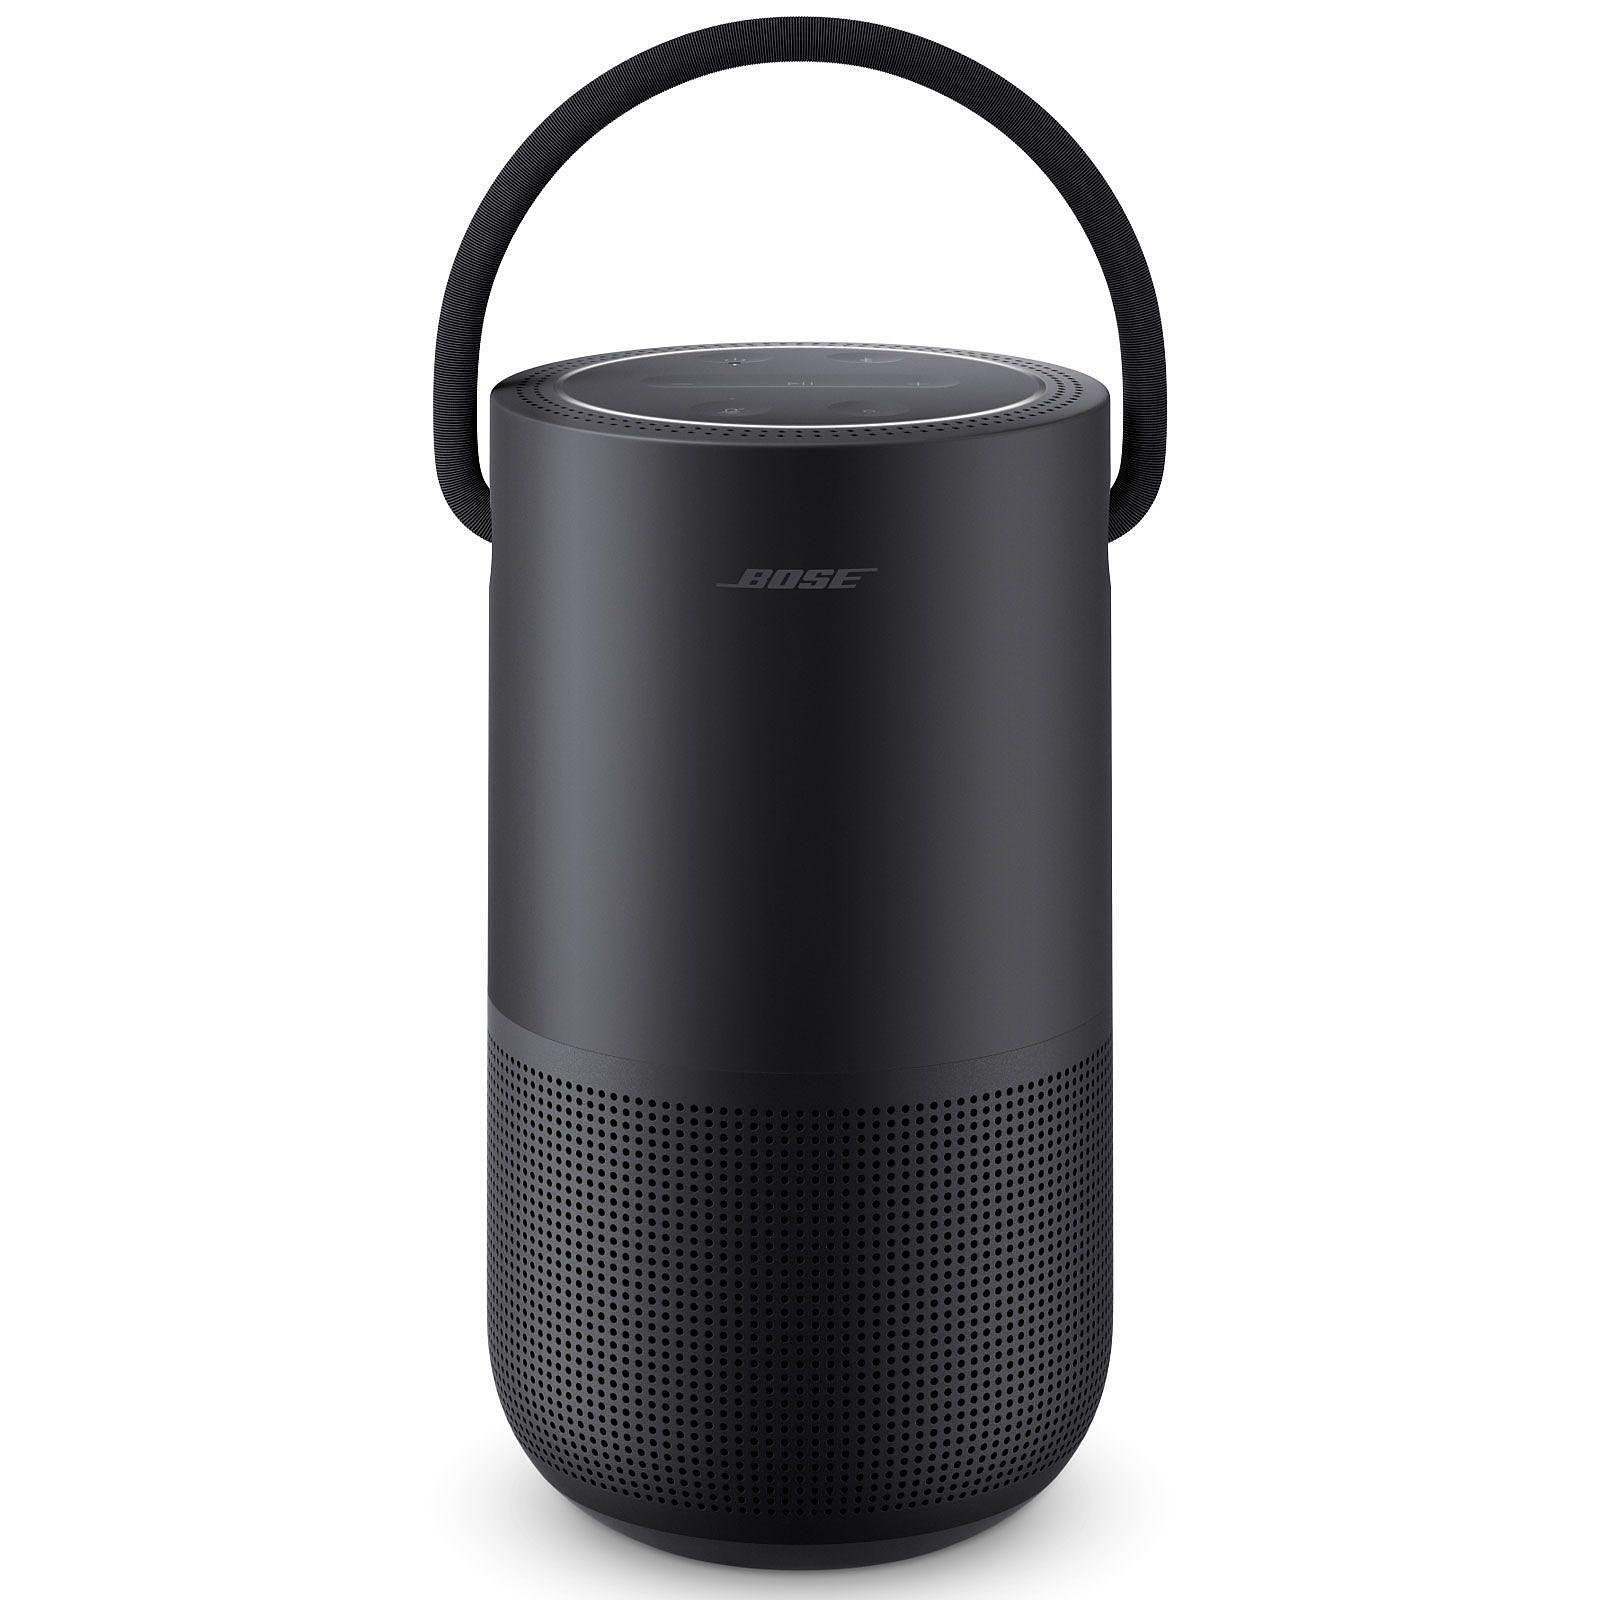 Enceinte sans-fil Bose Portable Smart Speaker